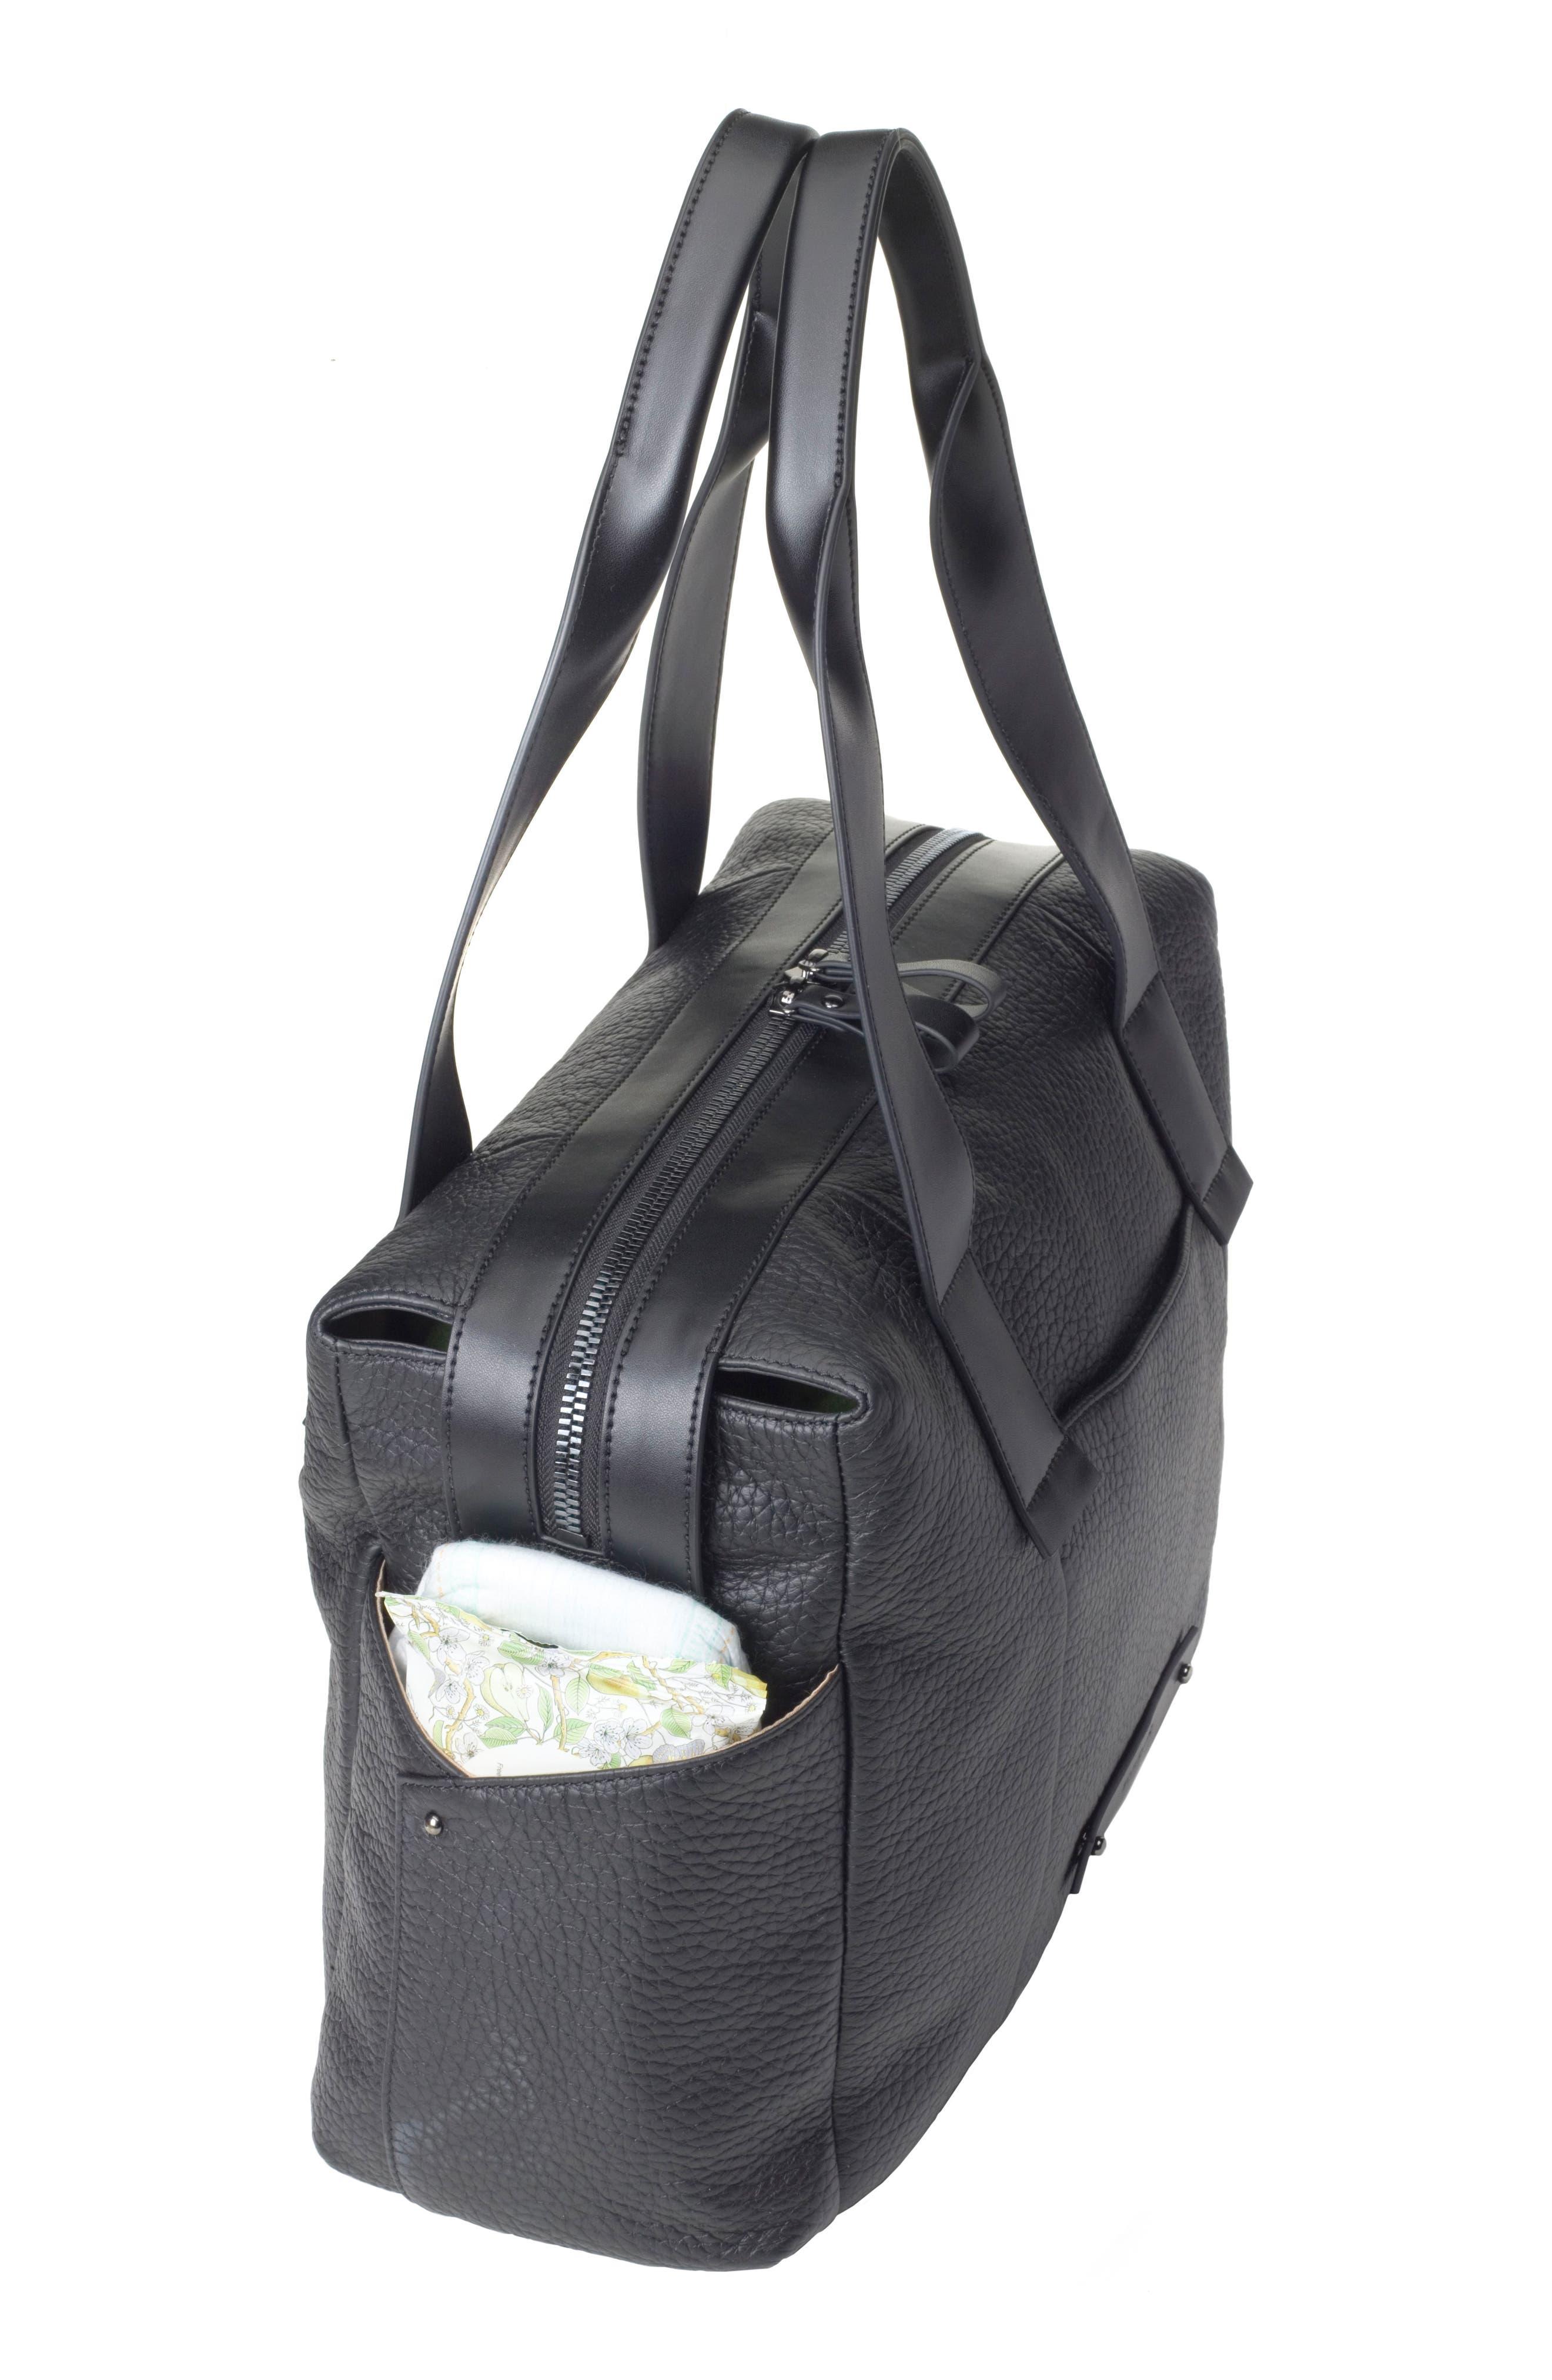 Kym Calfskin Leather Diaper Tote Bag,                             Alternate thumbnail 15, color,                             BLACK